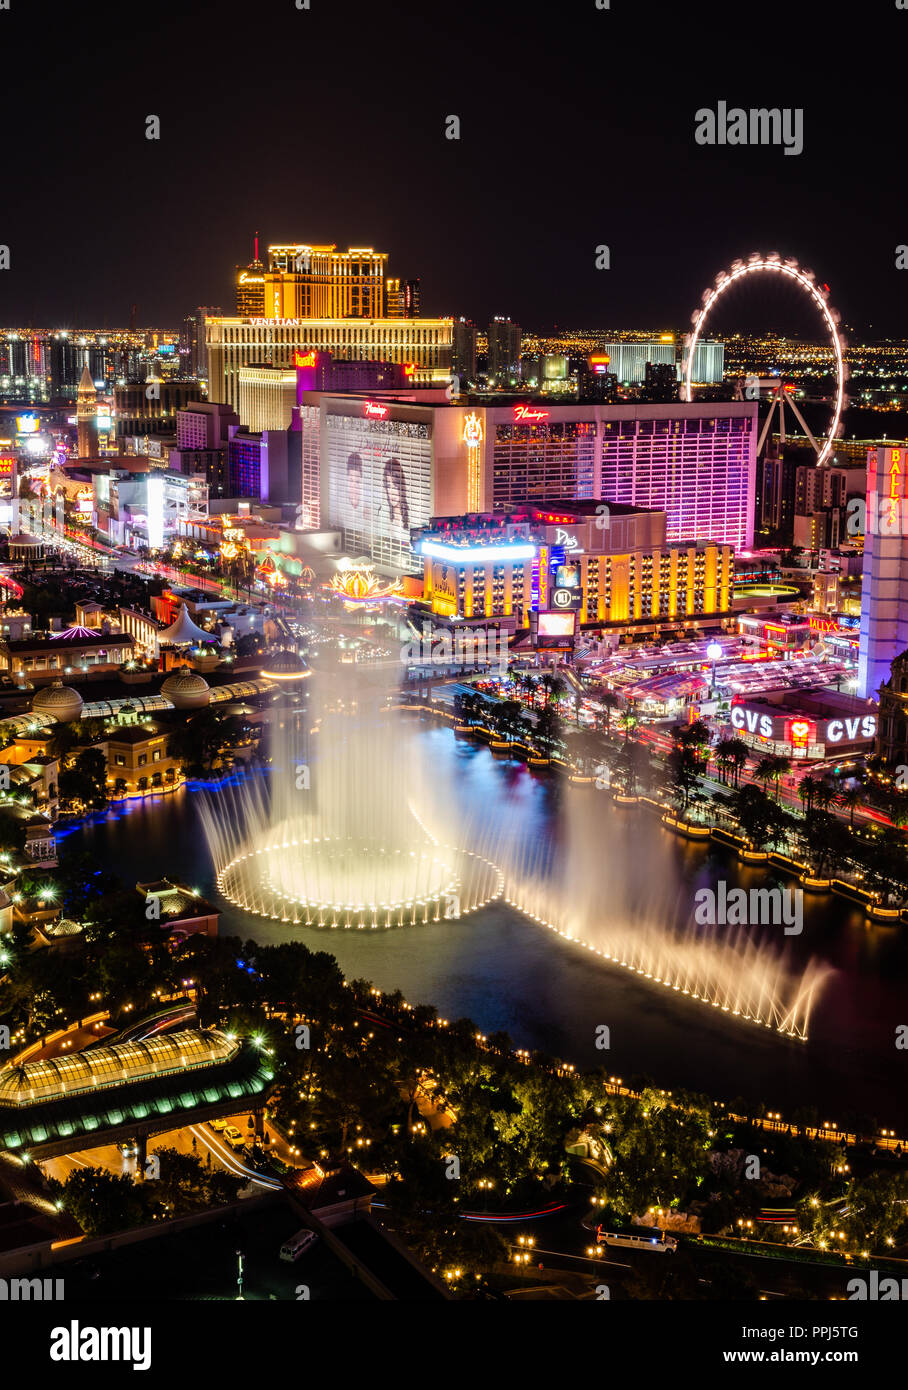 Linq Hotel Vegas Stock Photos & Linq Hotel Vegas Stock